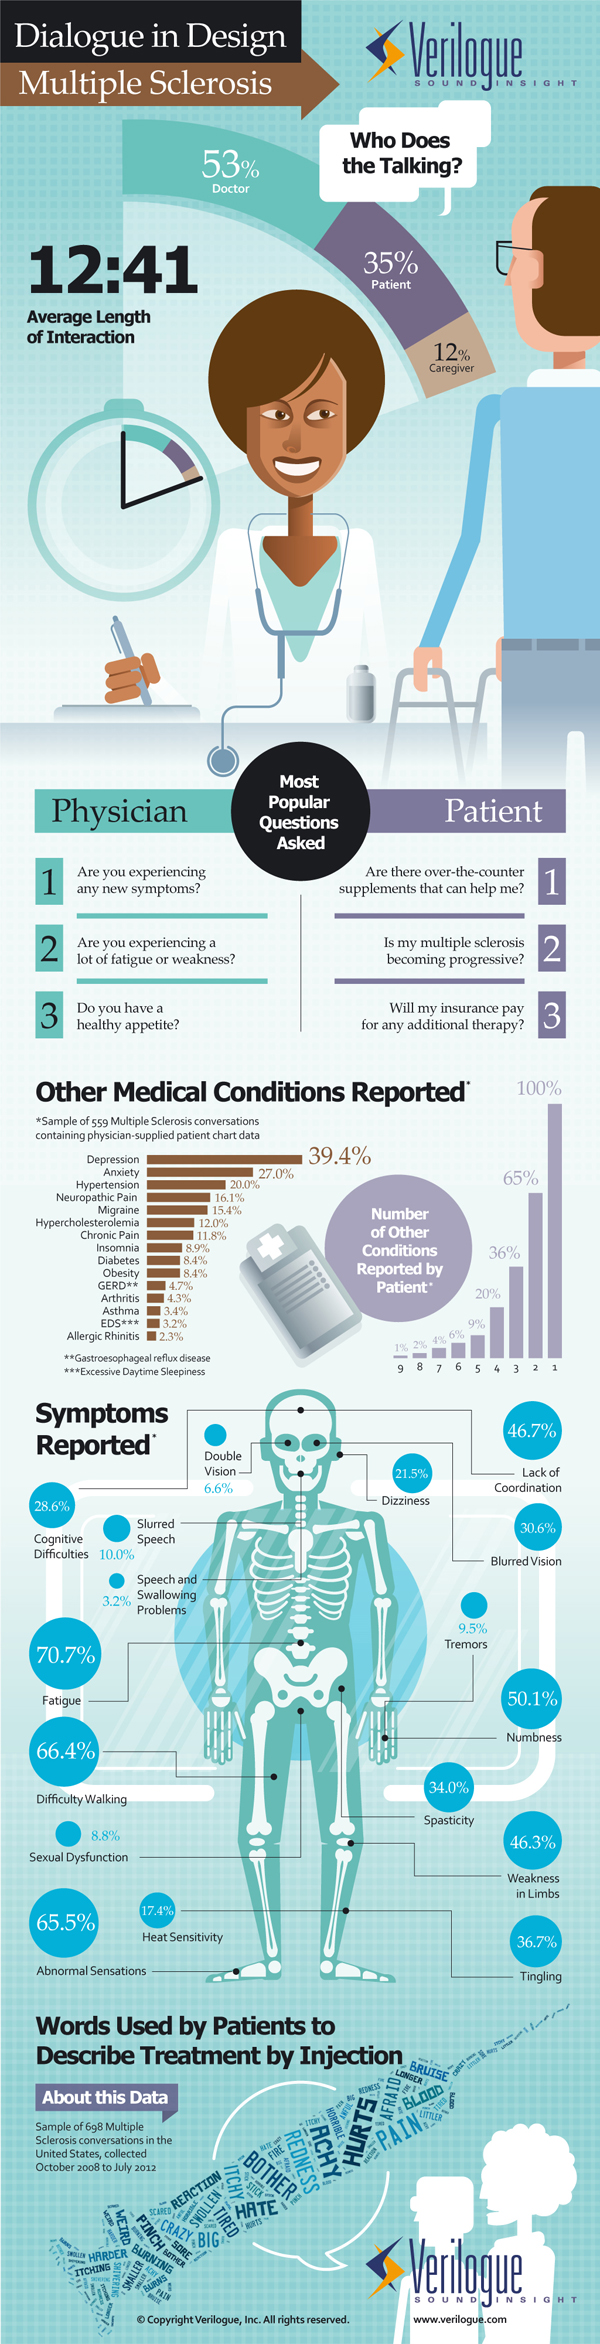 #Multiple-Sclerosis #ADL #IADL #welcome2seminars #infographic #bestpractice #ms